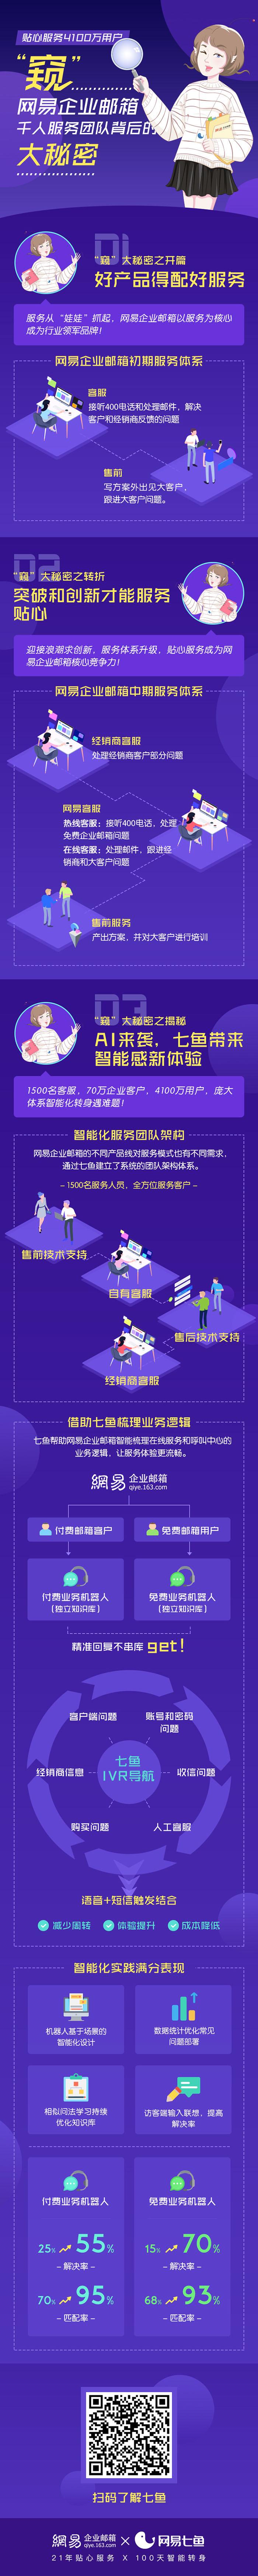 suoxiao企业邮箱-长图+码